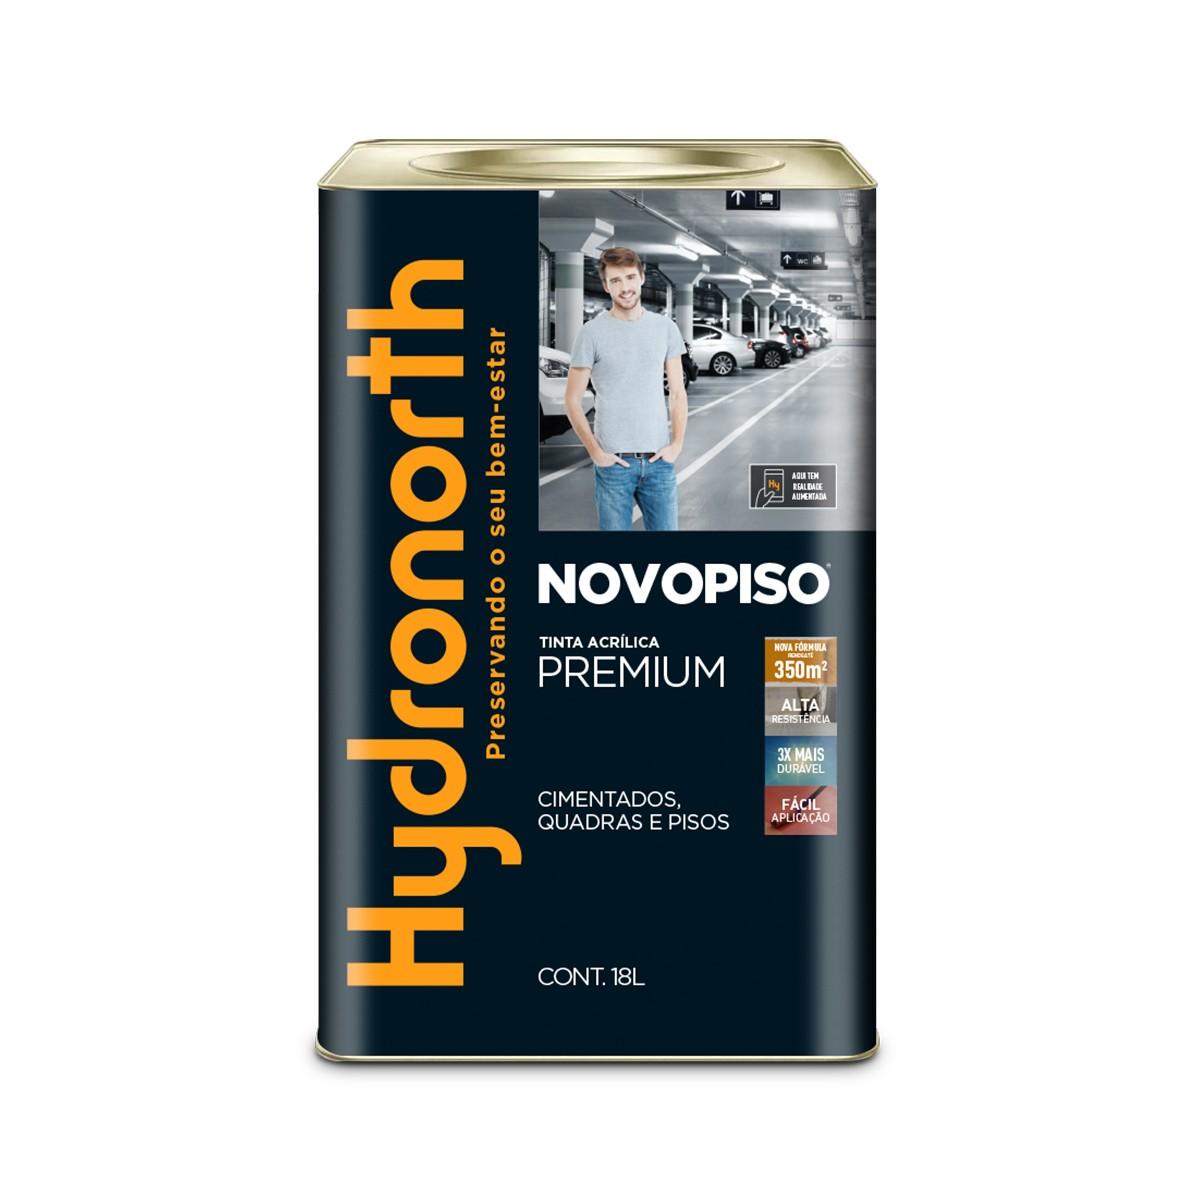 Tinta Acrilica Fosco Premium 18L - Amarelo Demarcacao - Novopiso Hydronorth